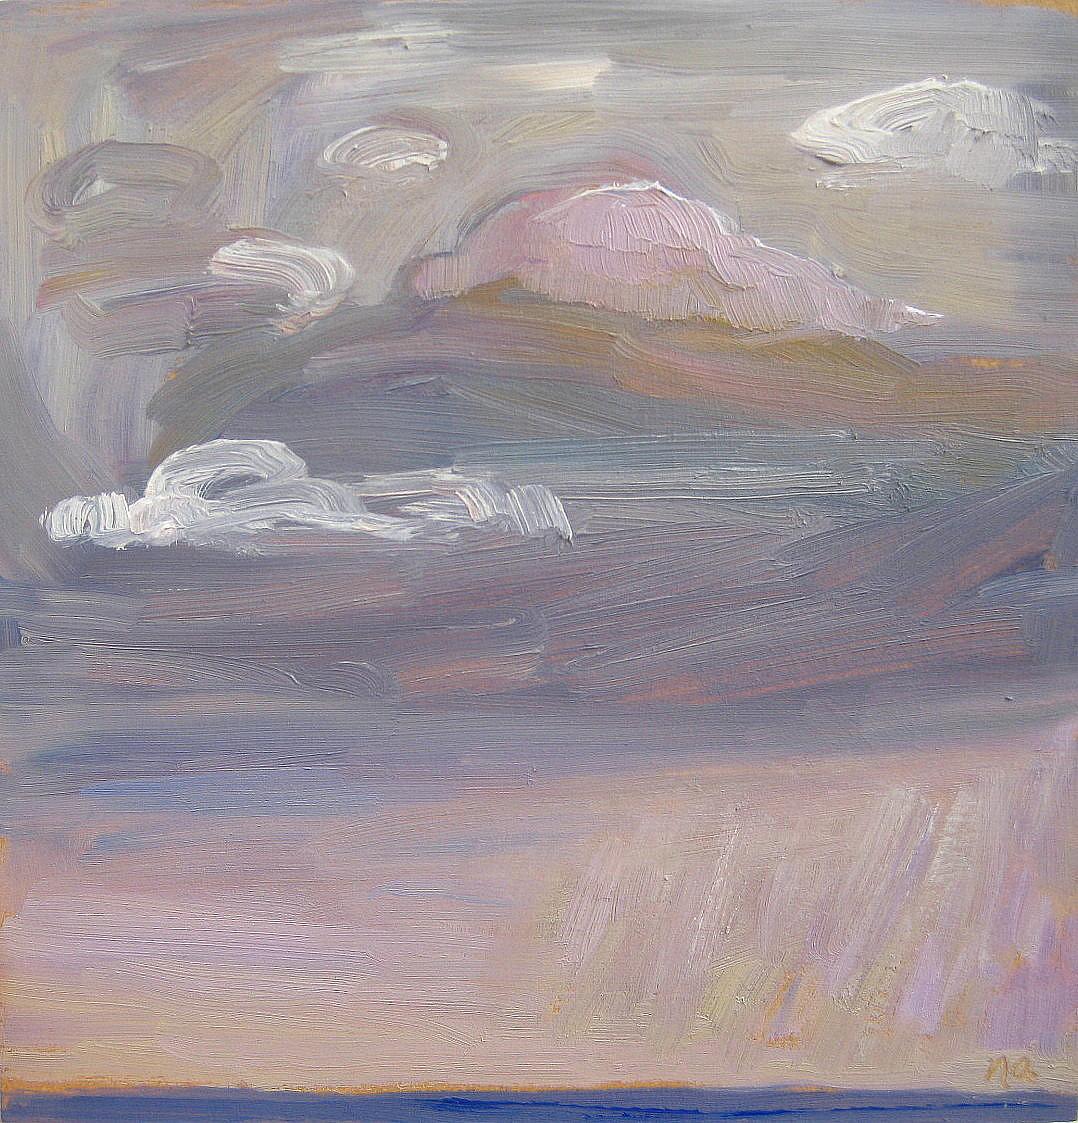 Quirk: An Experimental Sky original fine art by Nicki Ault